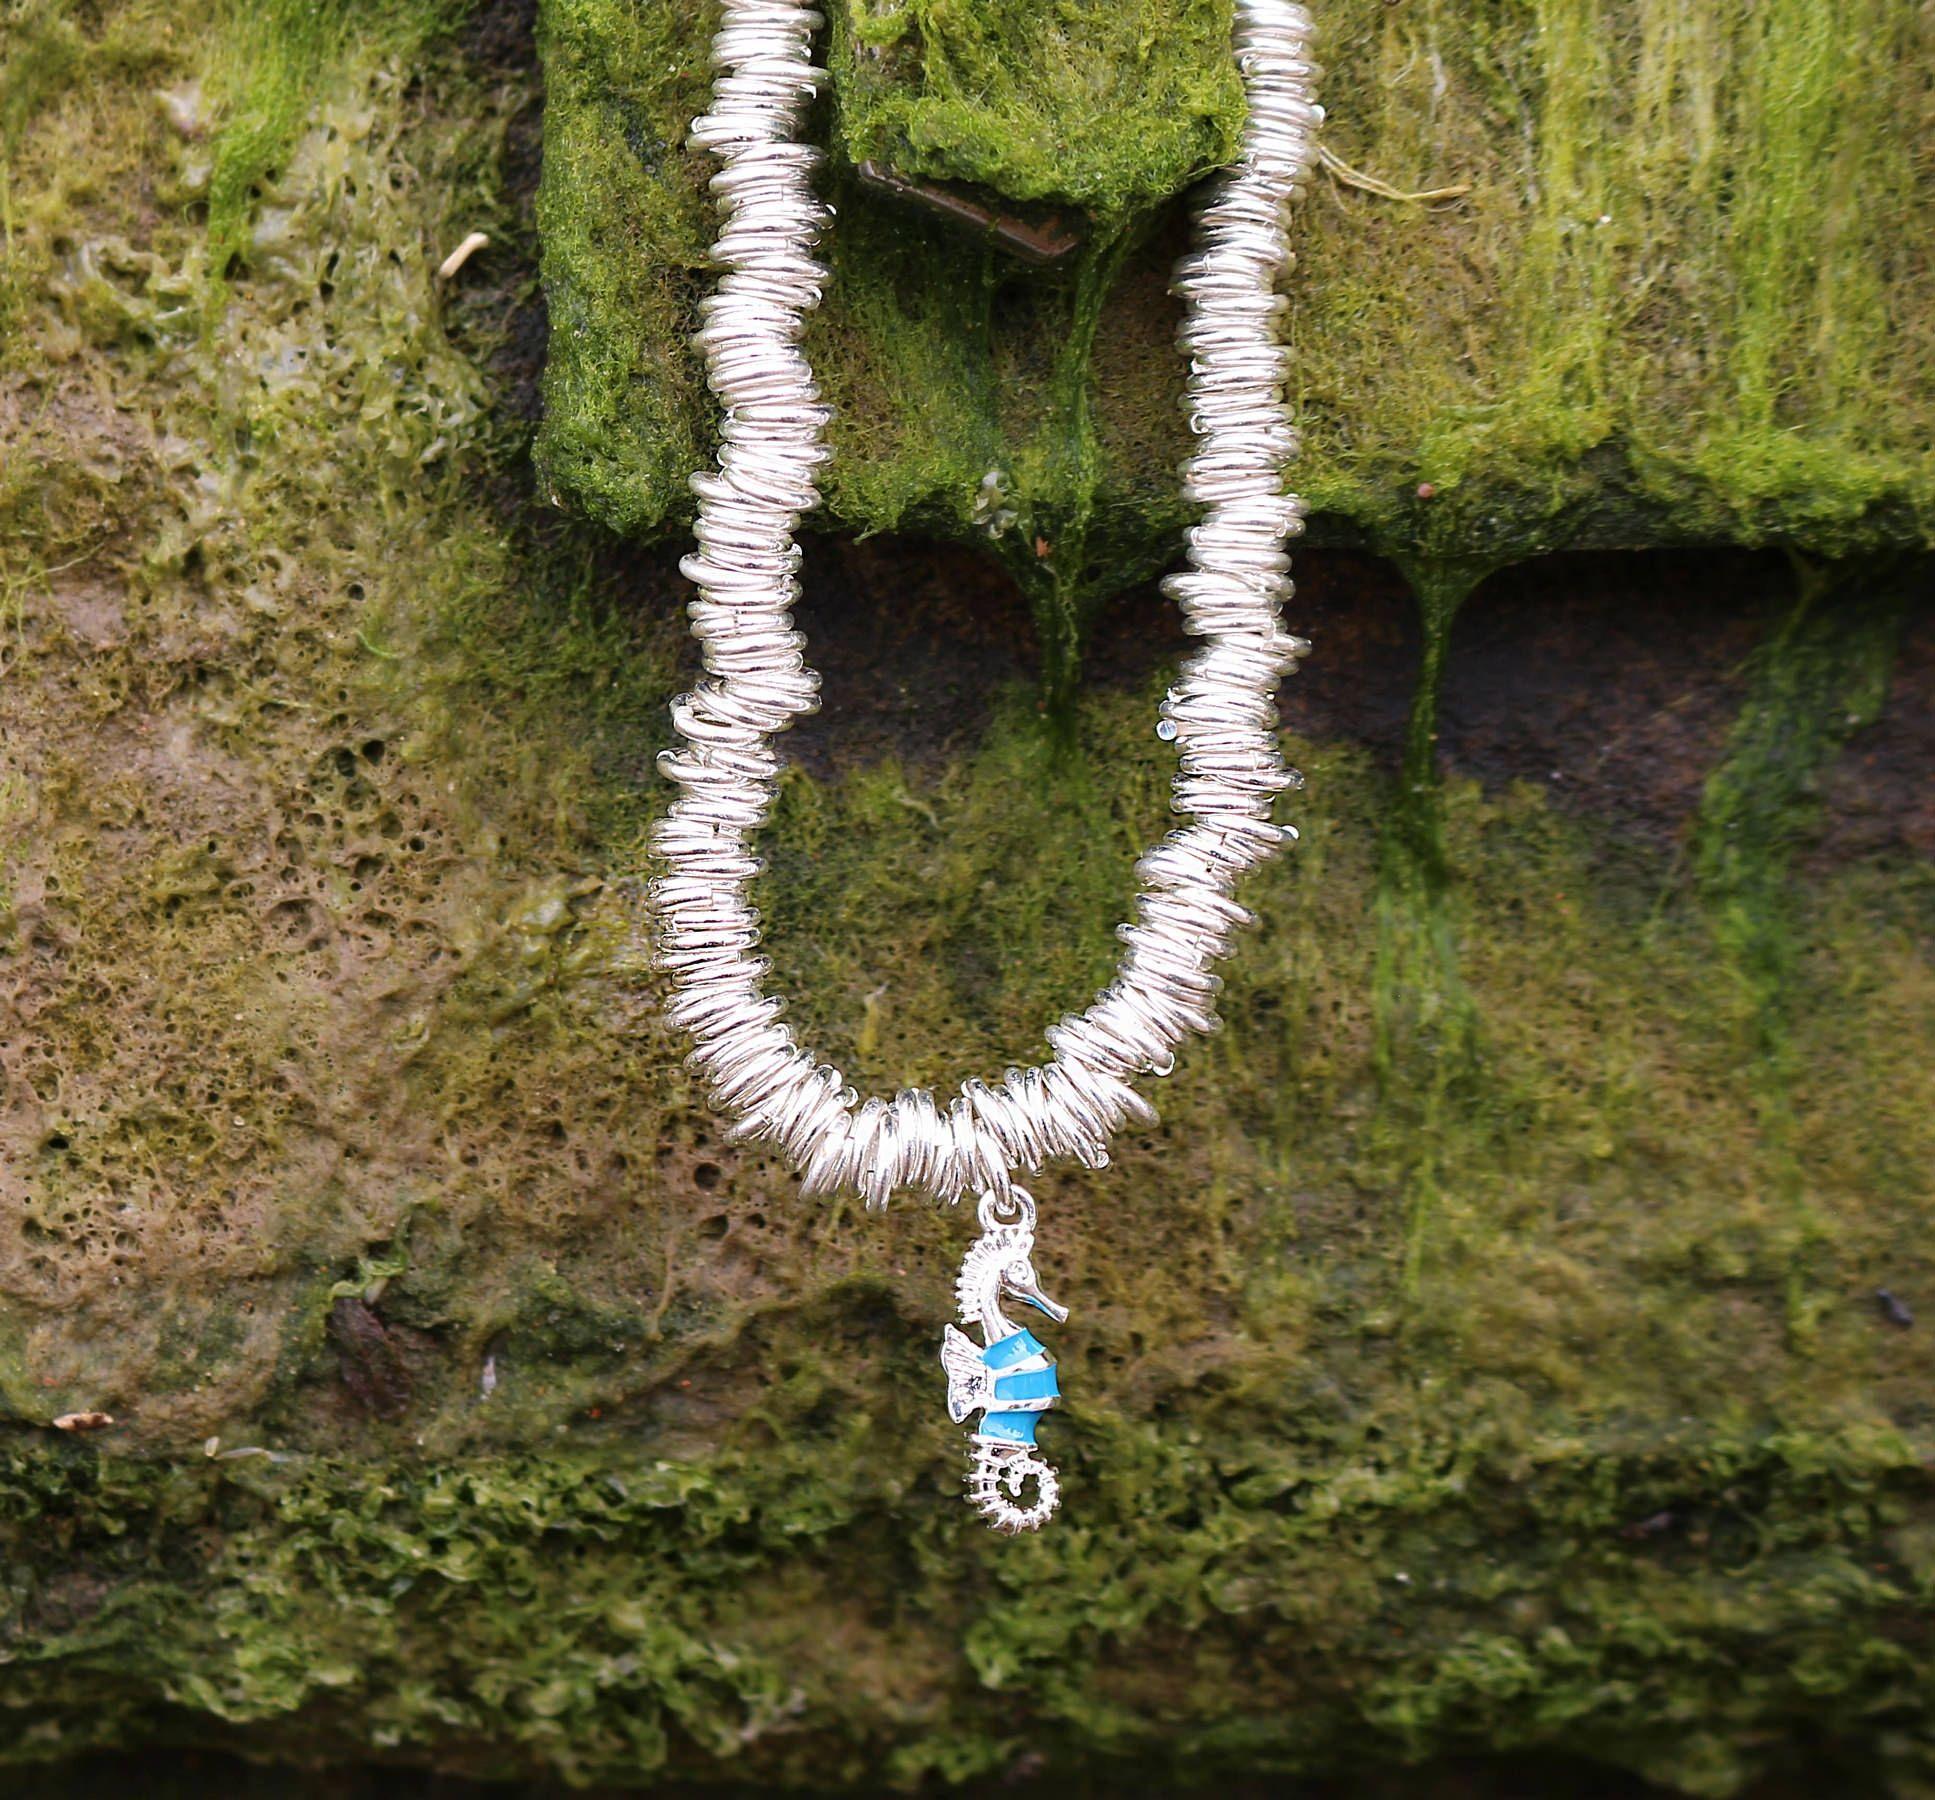 Buckley London Seahorse Charm Candy Bracelet